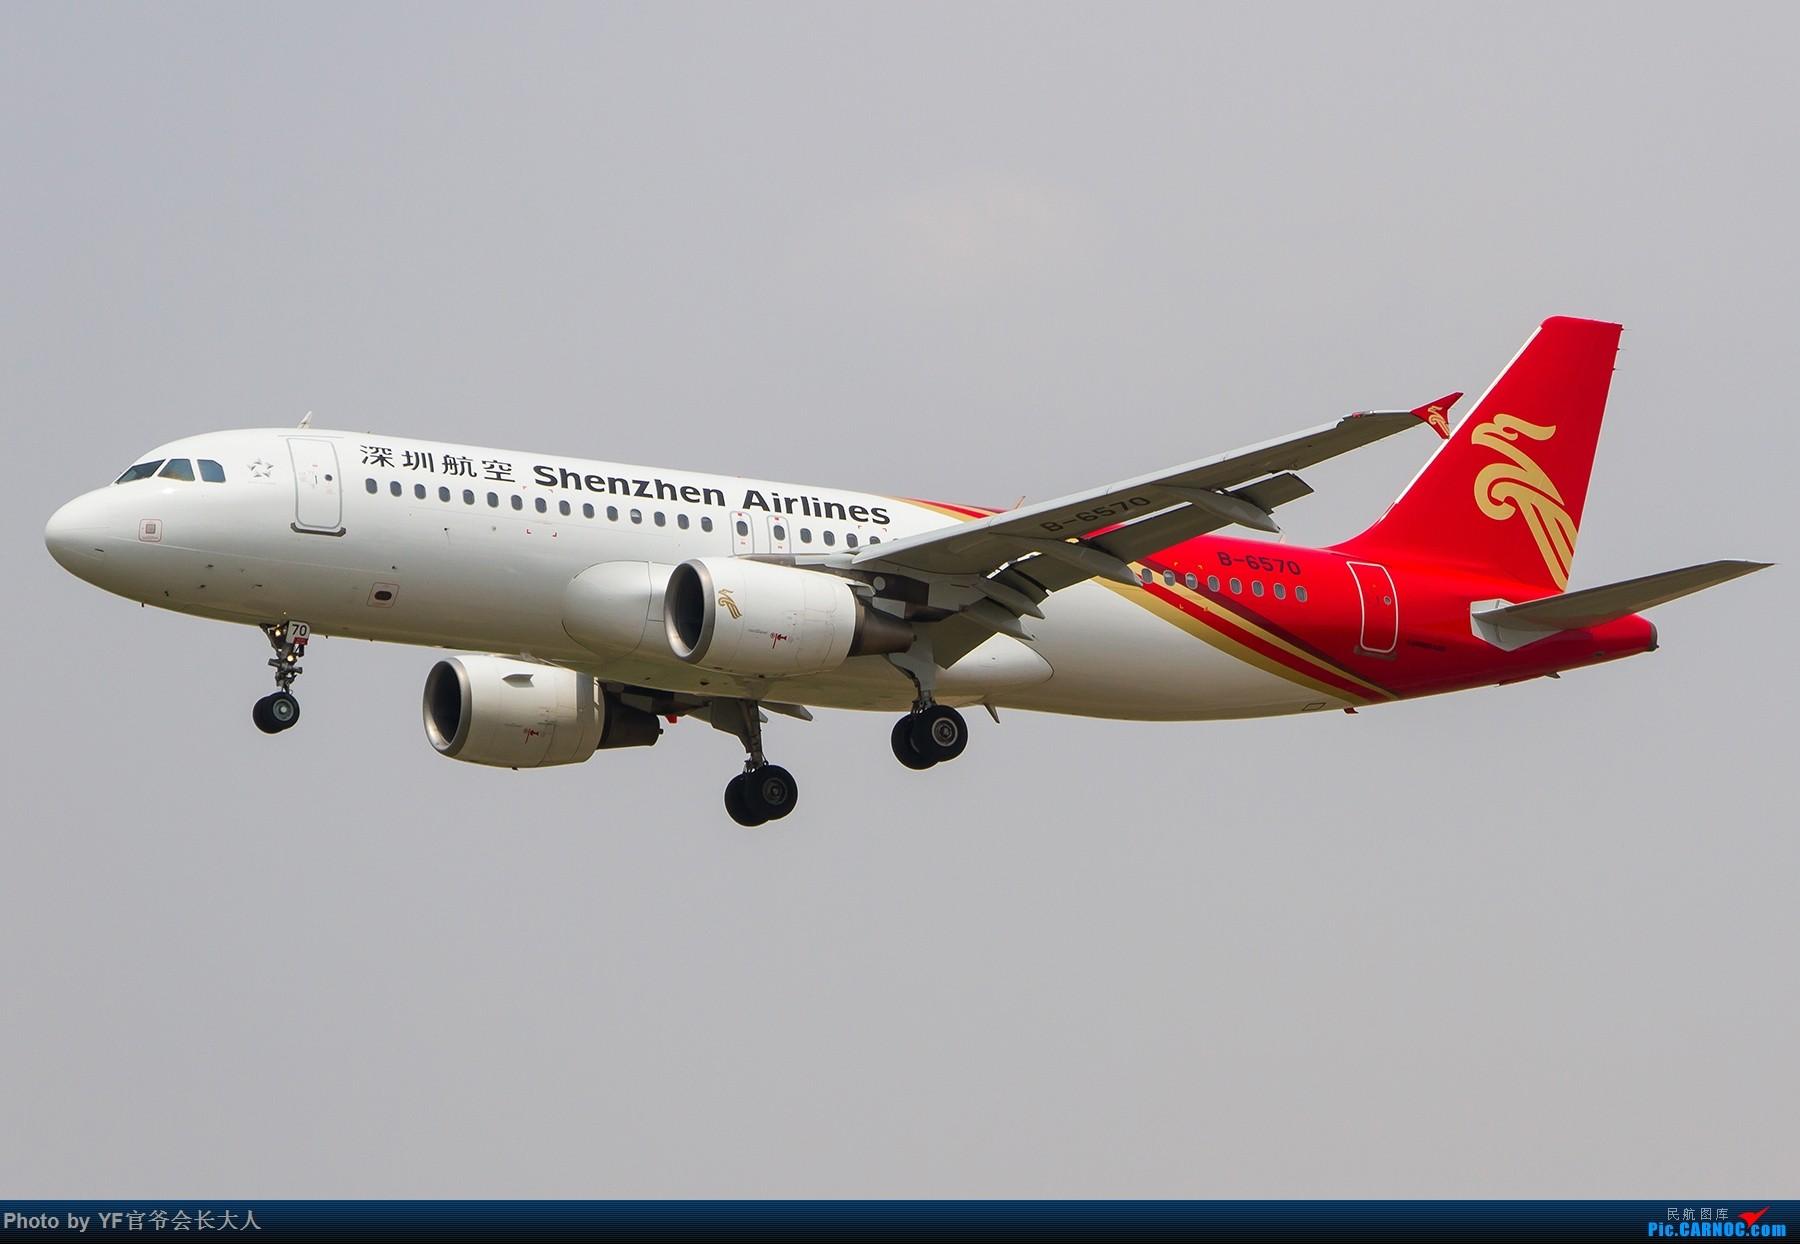 Re:[原创]【ZYTX】轻易不拍机,拍就要拍个过瘾!(新开的酷鸟,亚洲大西洋,顺带碰上朝韩两国的好货) AIRBUS A320-200 B-6570 中国沈阳桃仙国际机场